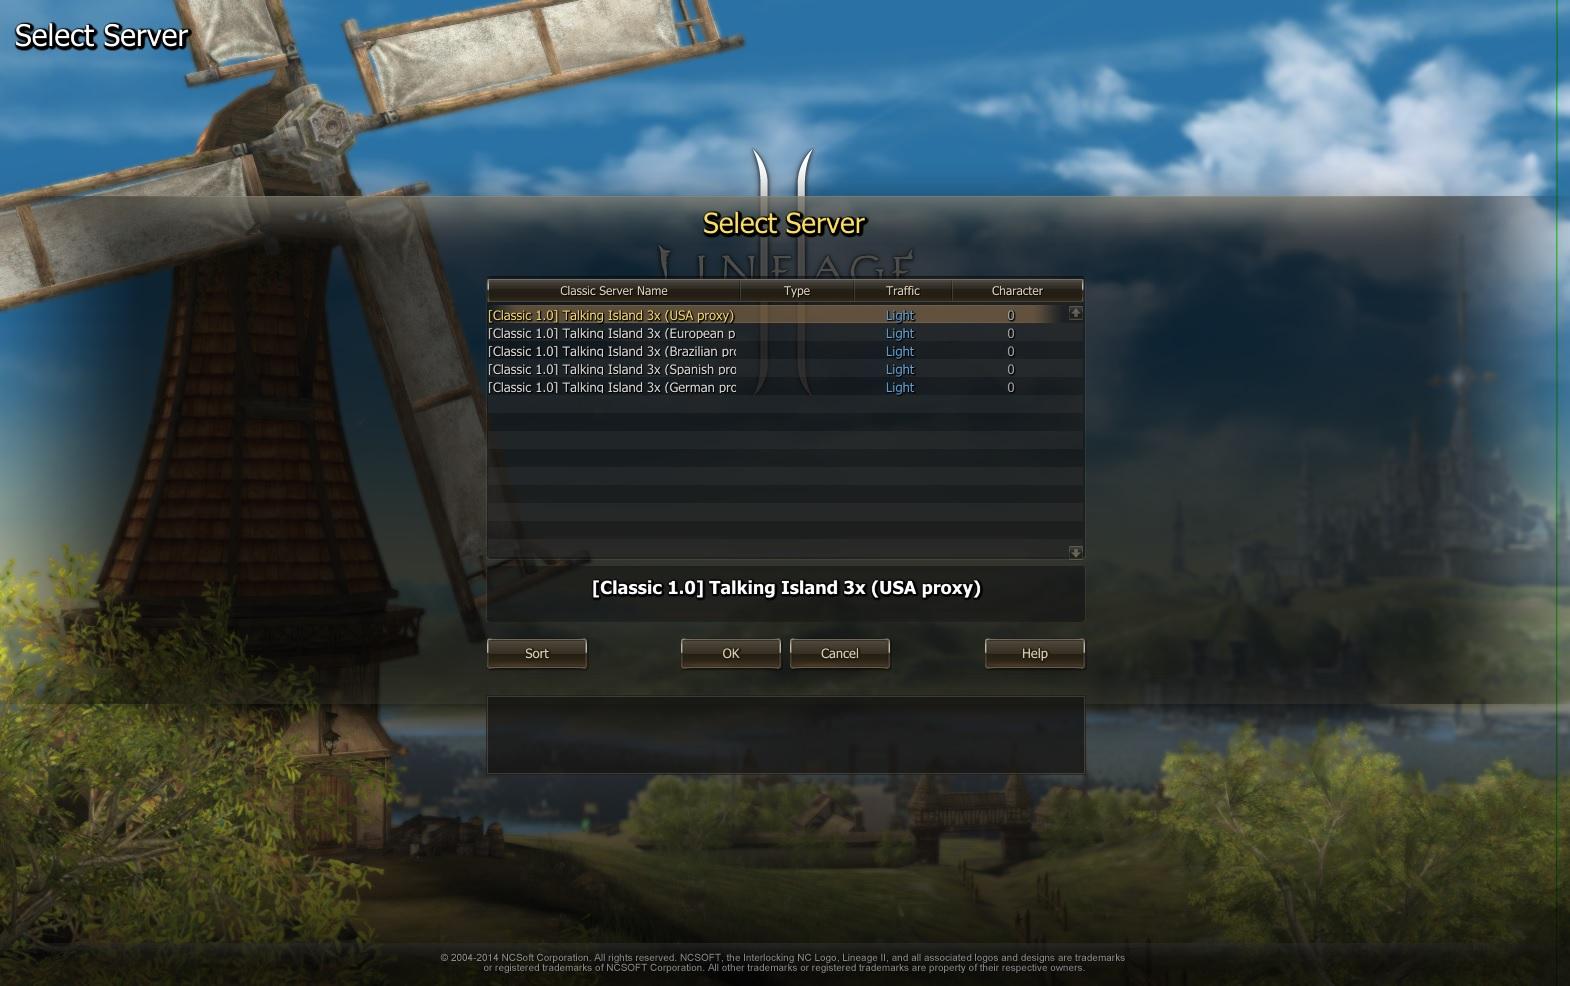 Select Server - I need help - Lineage 2 Classic